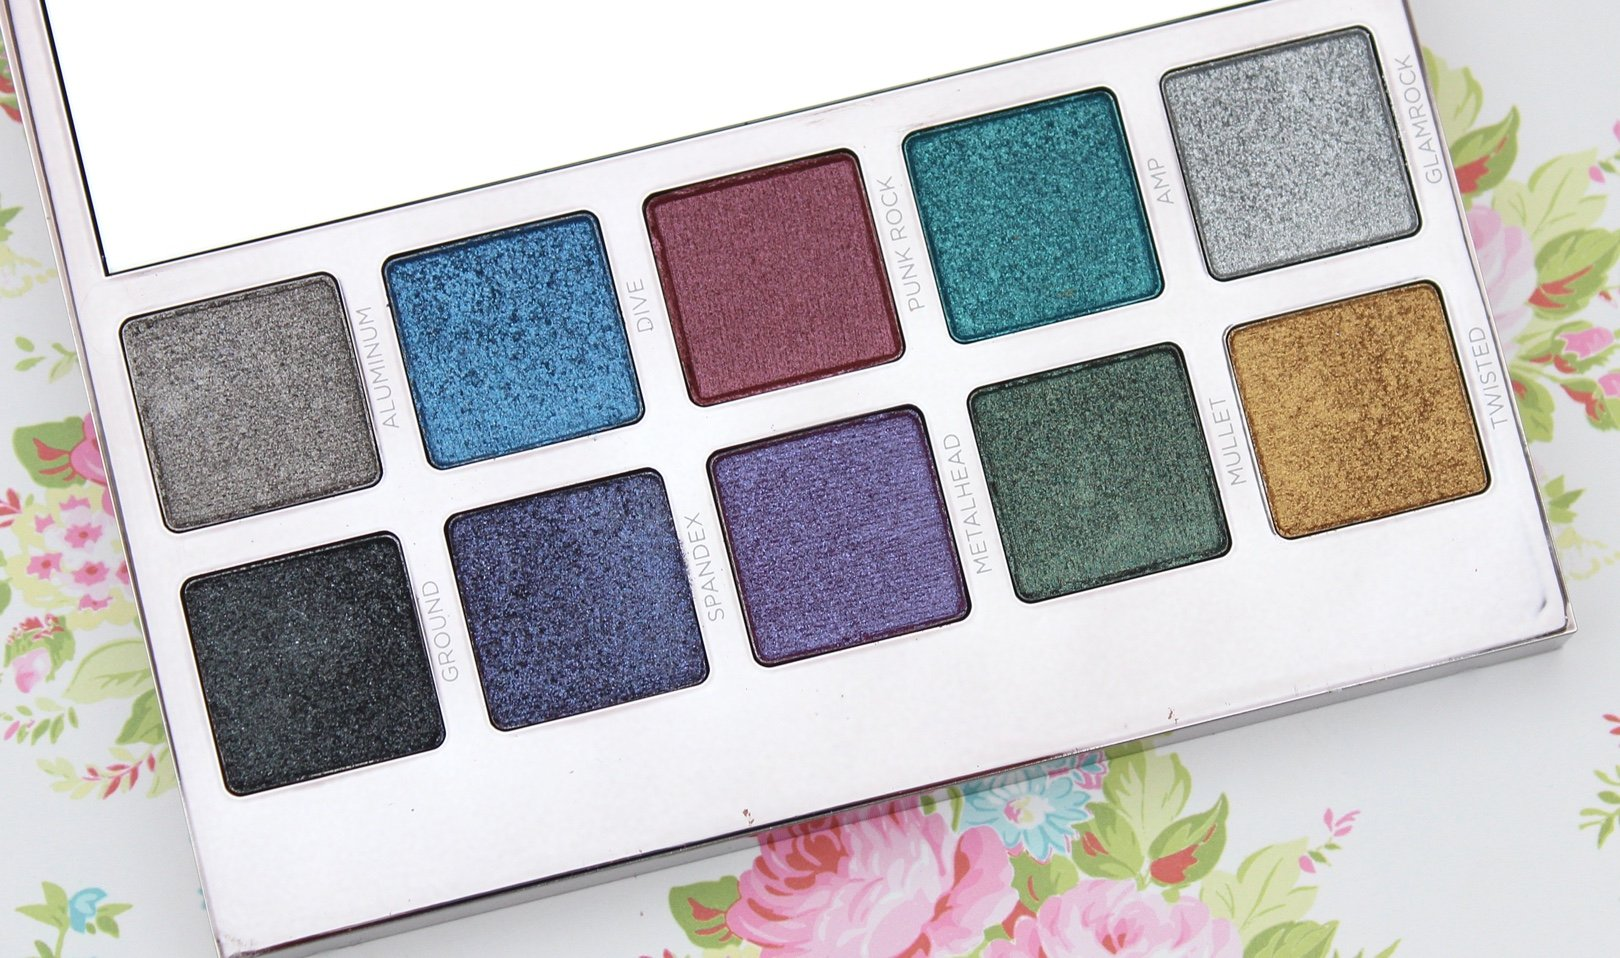 Urban Decay Heavy Metals Metallic Eyeshadow Palette beauty blog